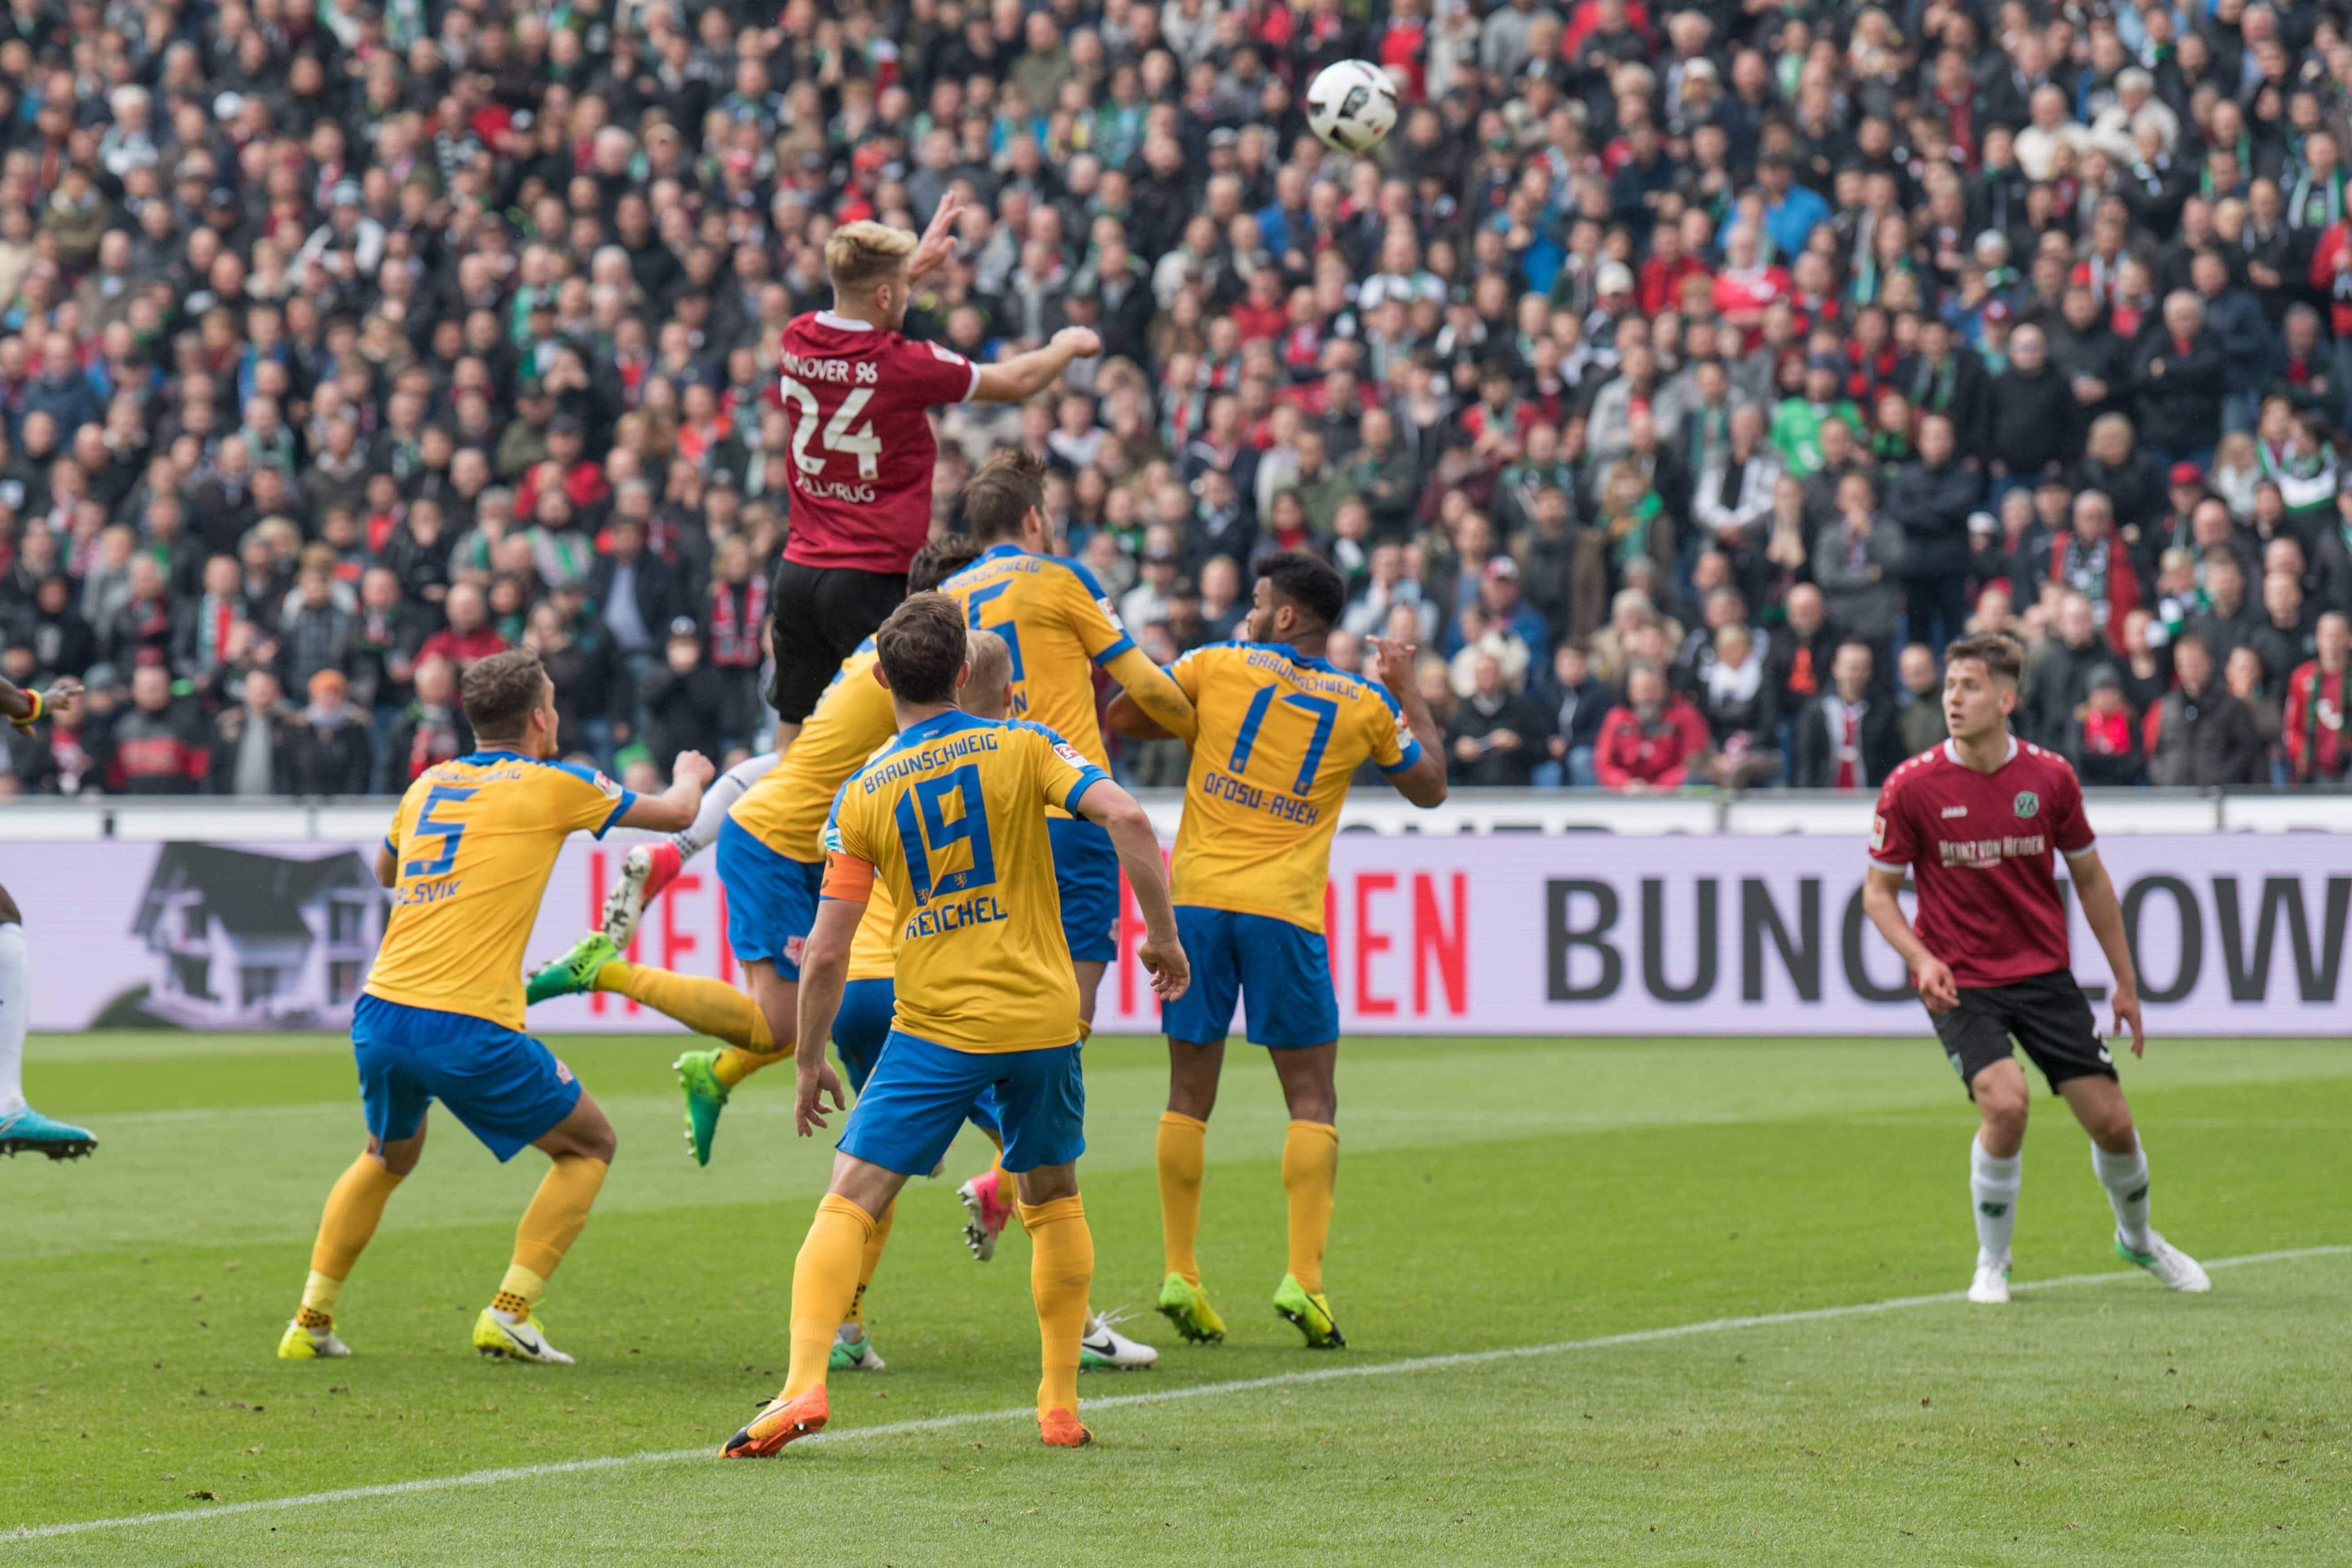 GER 2 FBL Hannover 96 vs Eintracht Braunschweig 15 04 2017 HDI Arena Hannover GER 2 FBL Hanno